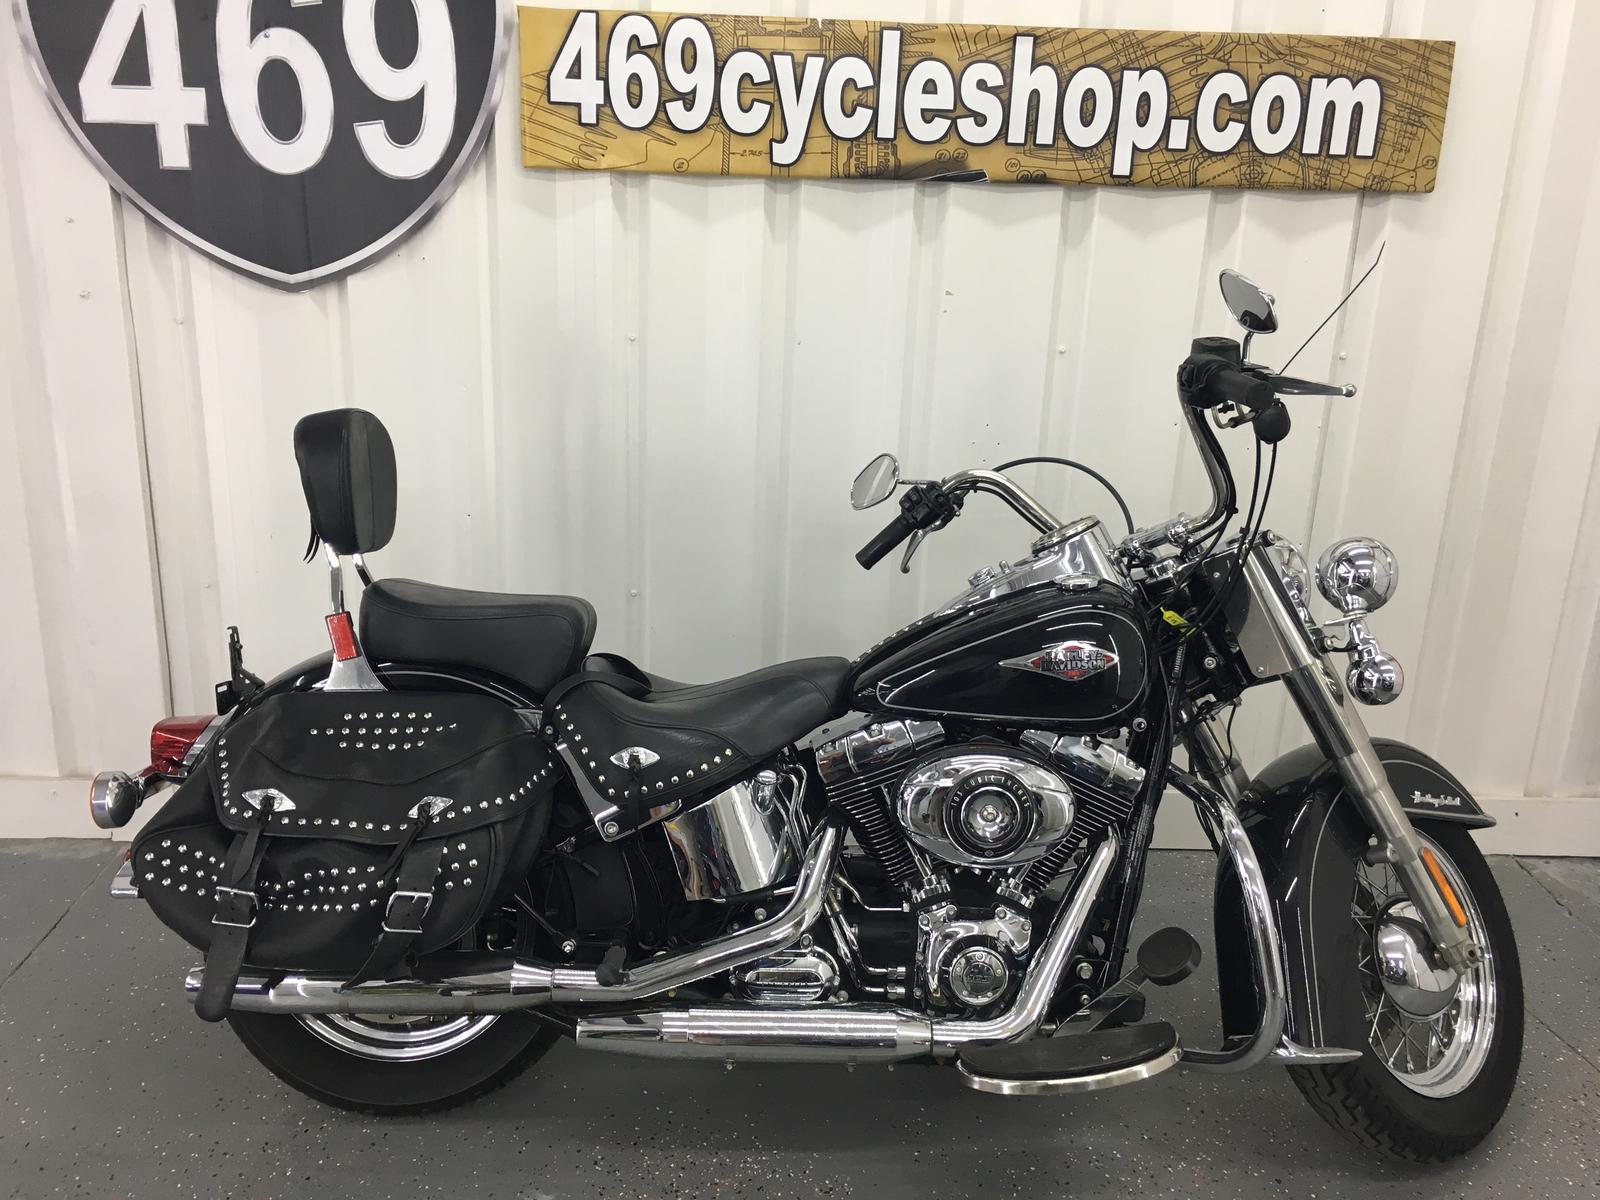 469 Cycle Shop Harley Davidson Heritage Softail Clic 2013 Flstc